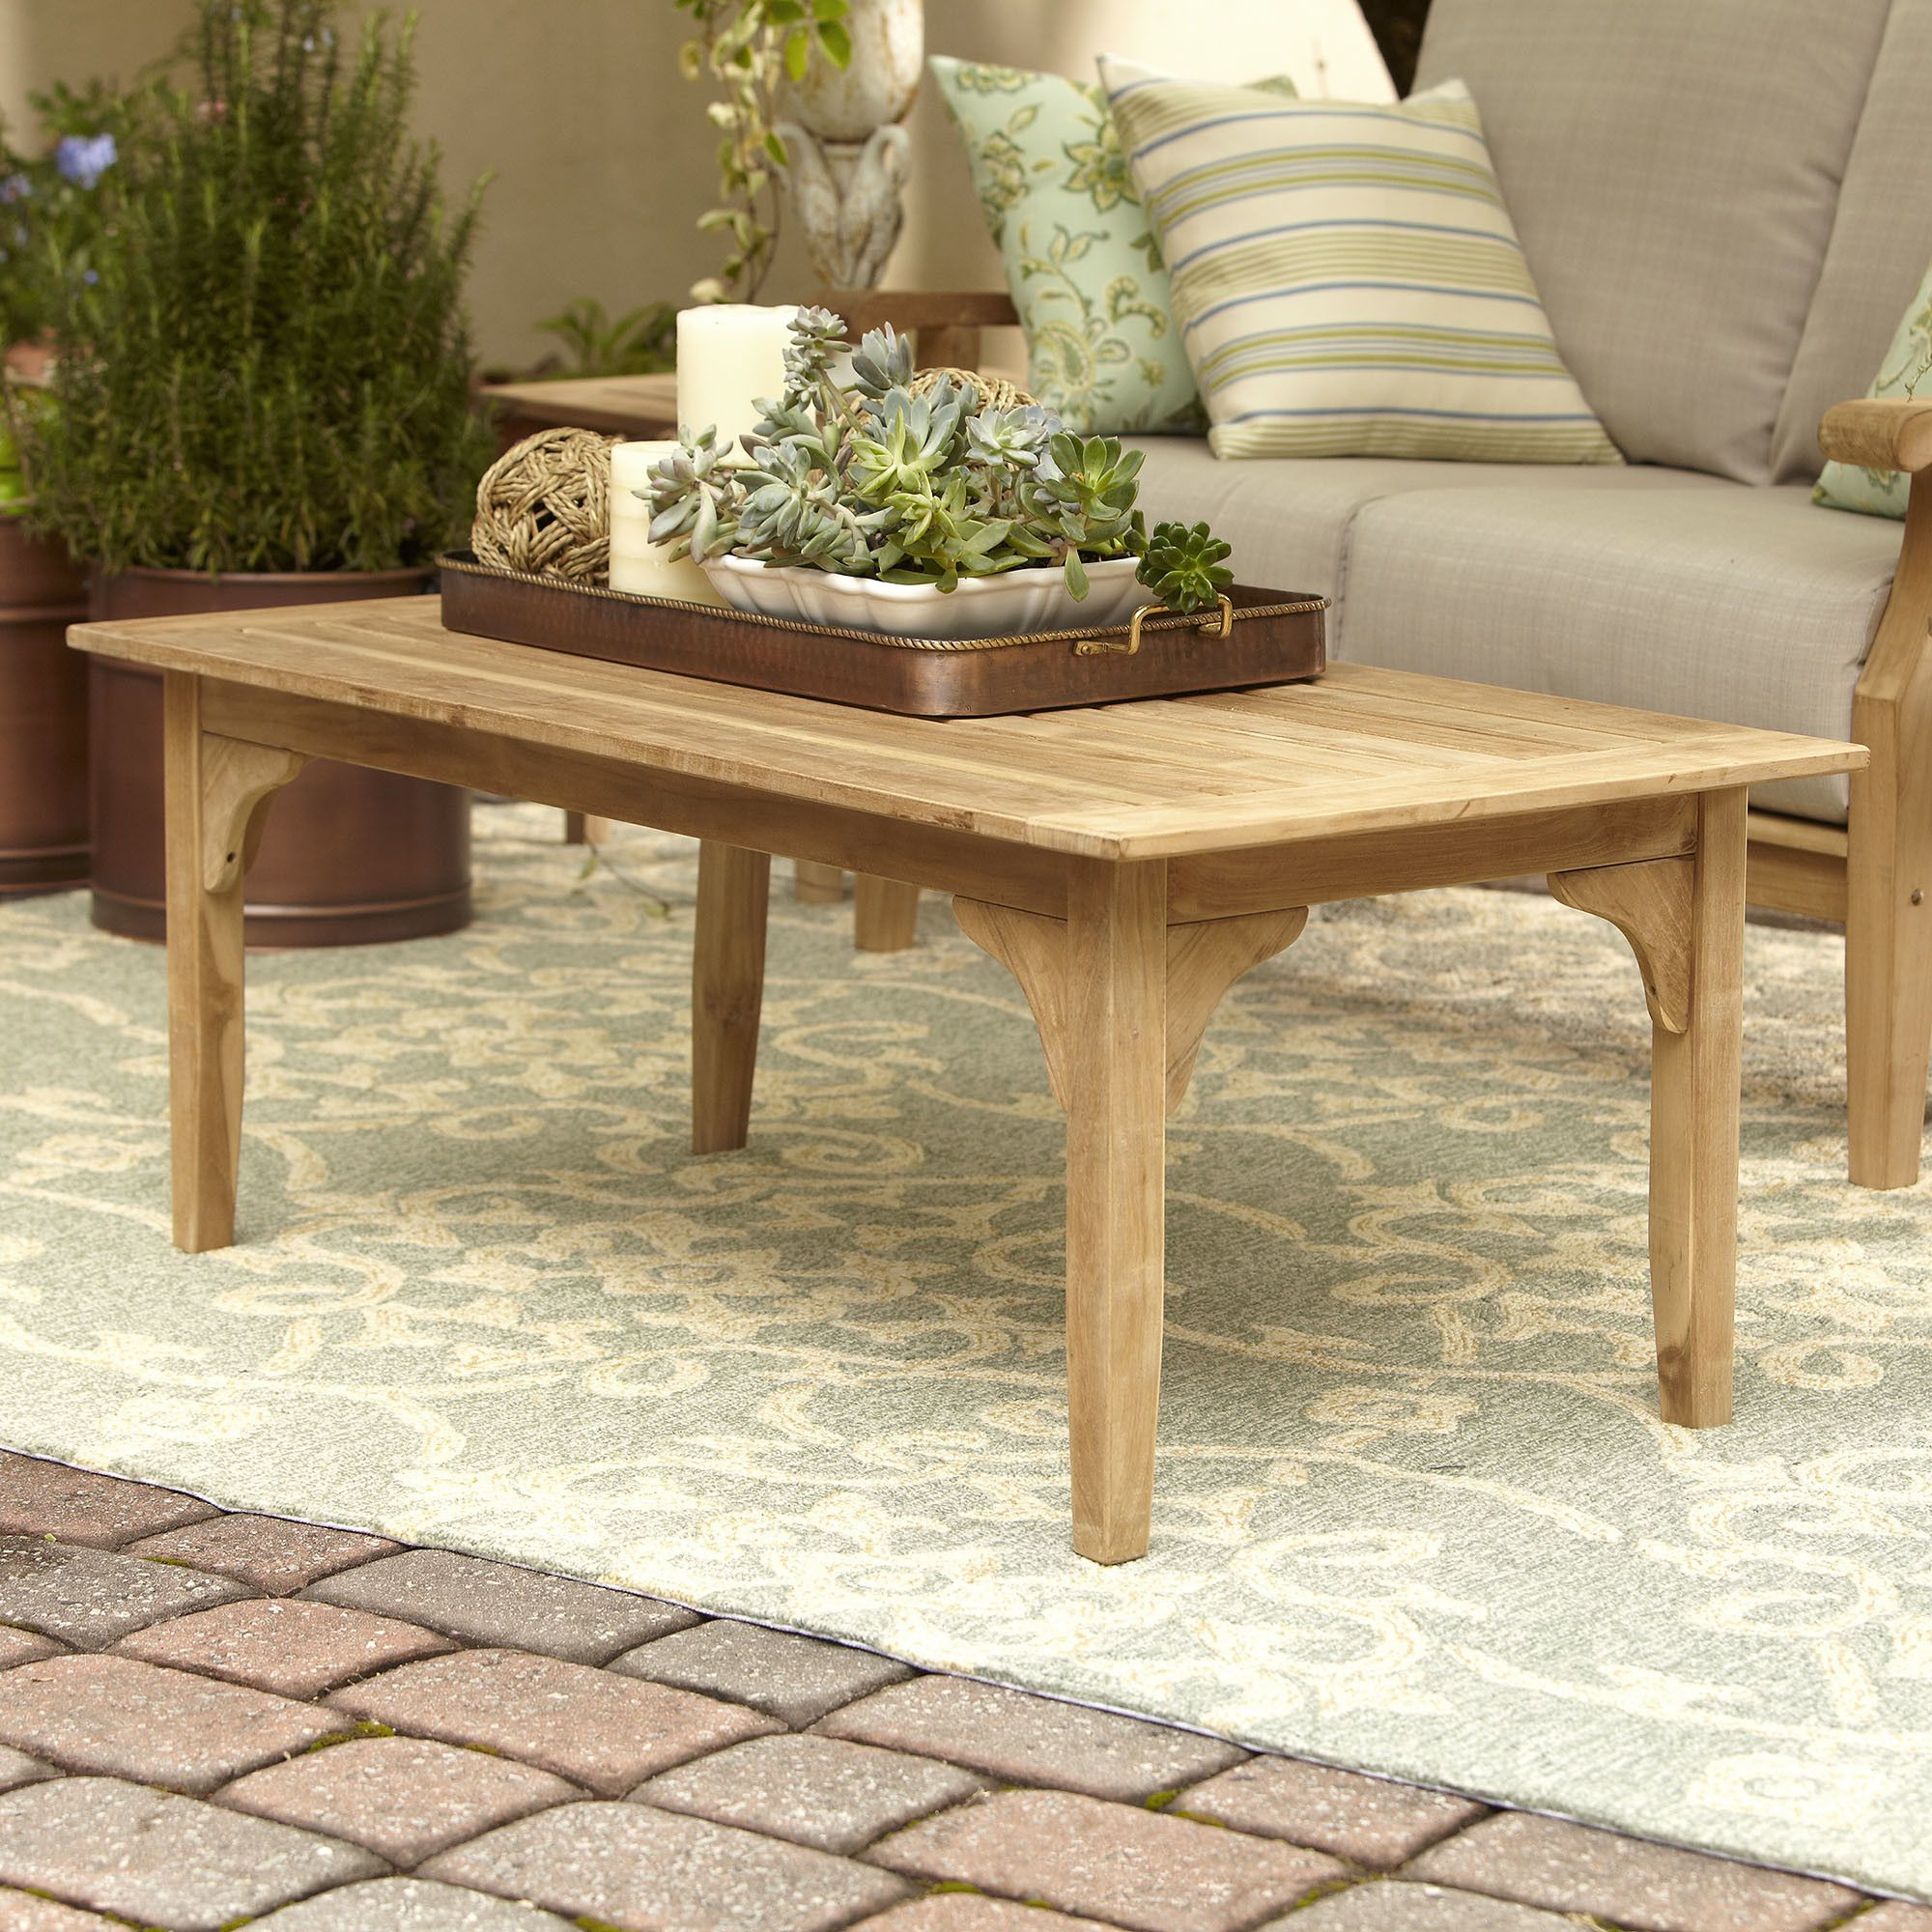 Summerton Teak Coffee Table Coffee Table Coffee Table Wood Outdoor Coffee Tables [ 2000 x 2000 Pixel ]